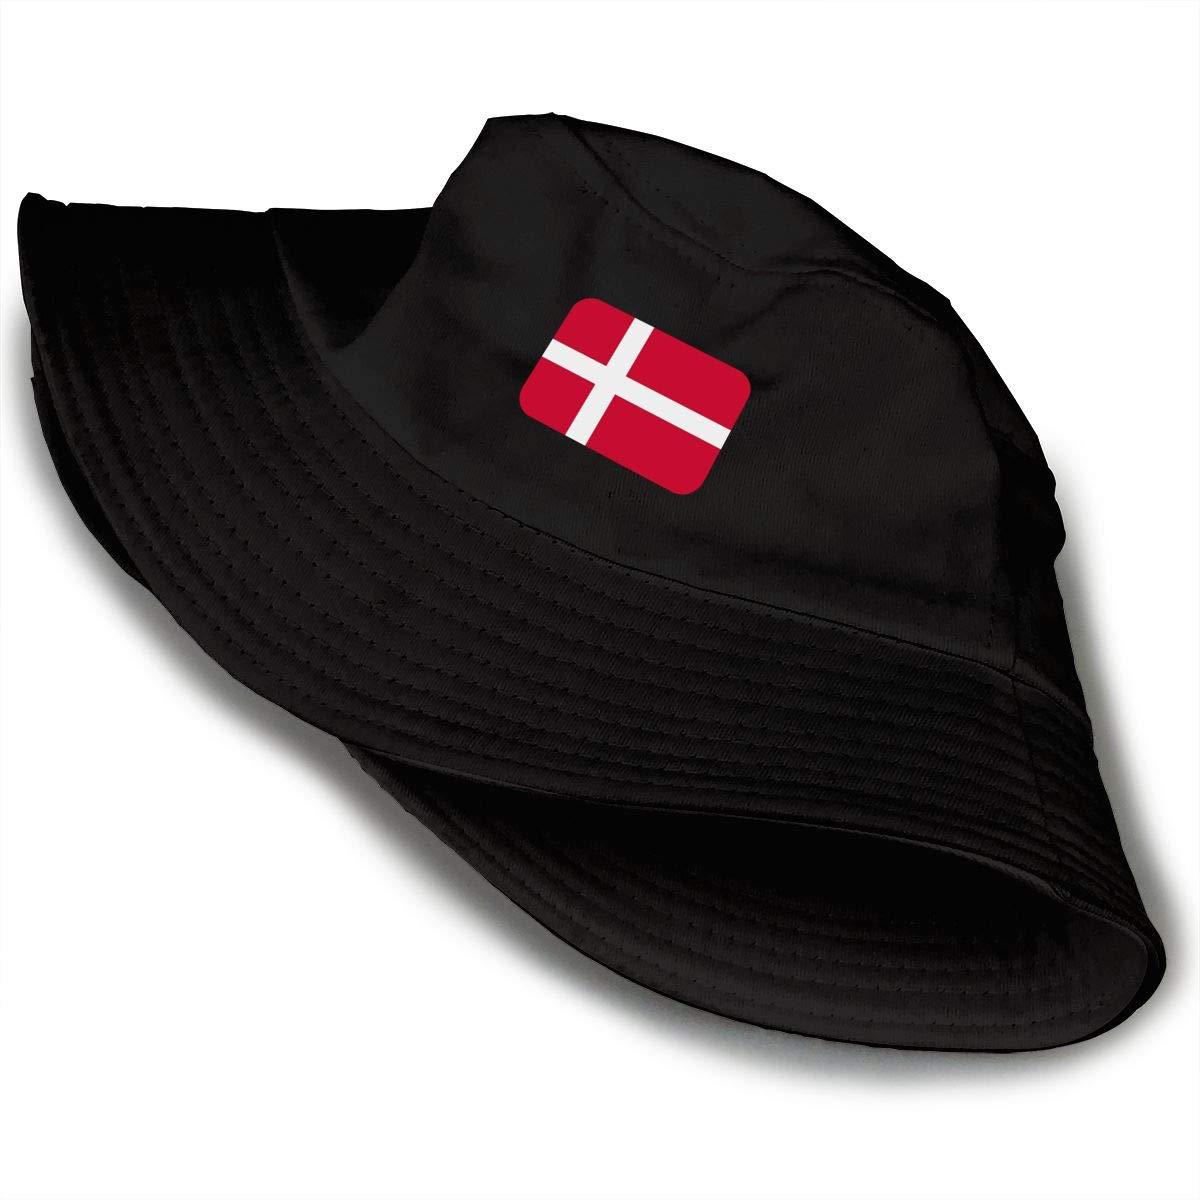 NDFGR Denmark Unisex Cotton Packable Black Travel Bucket Hat Fishing Cap